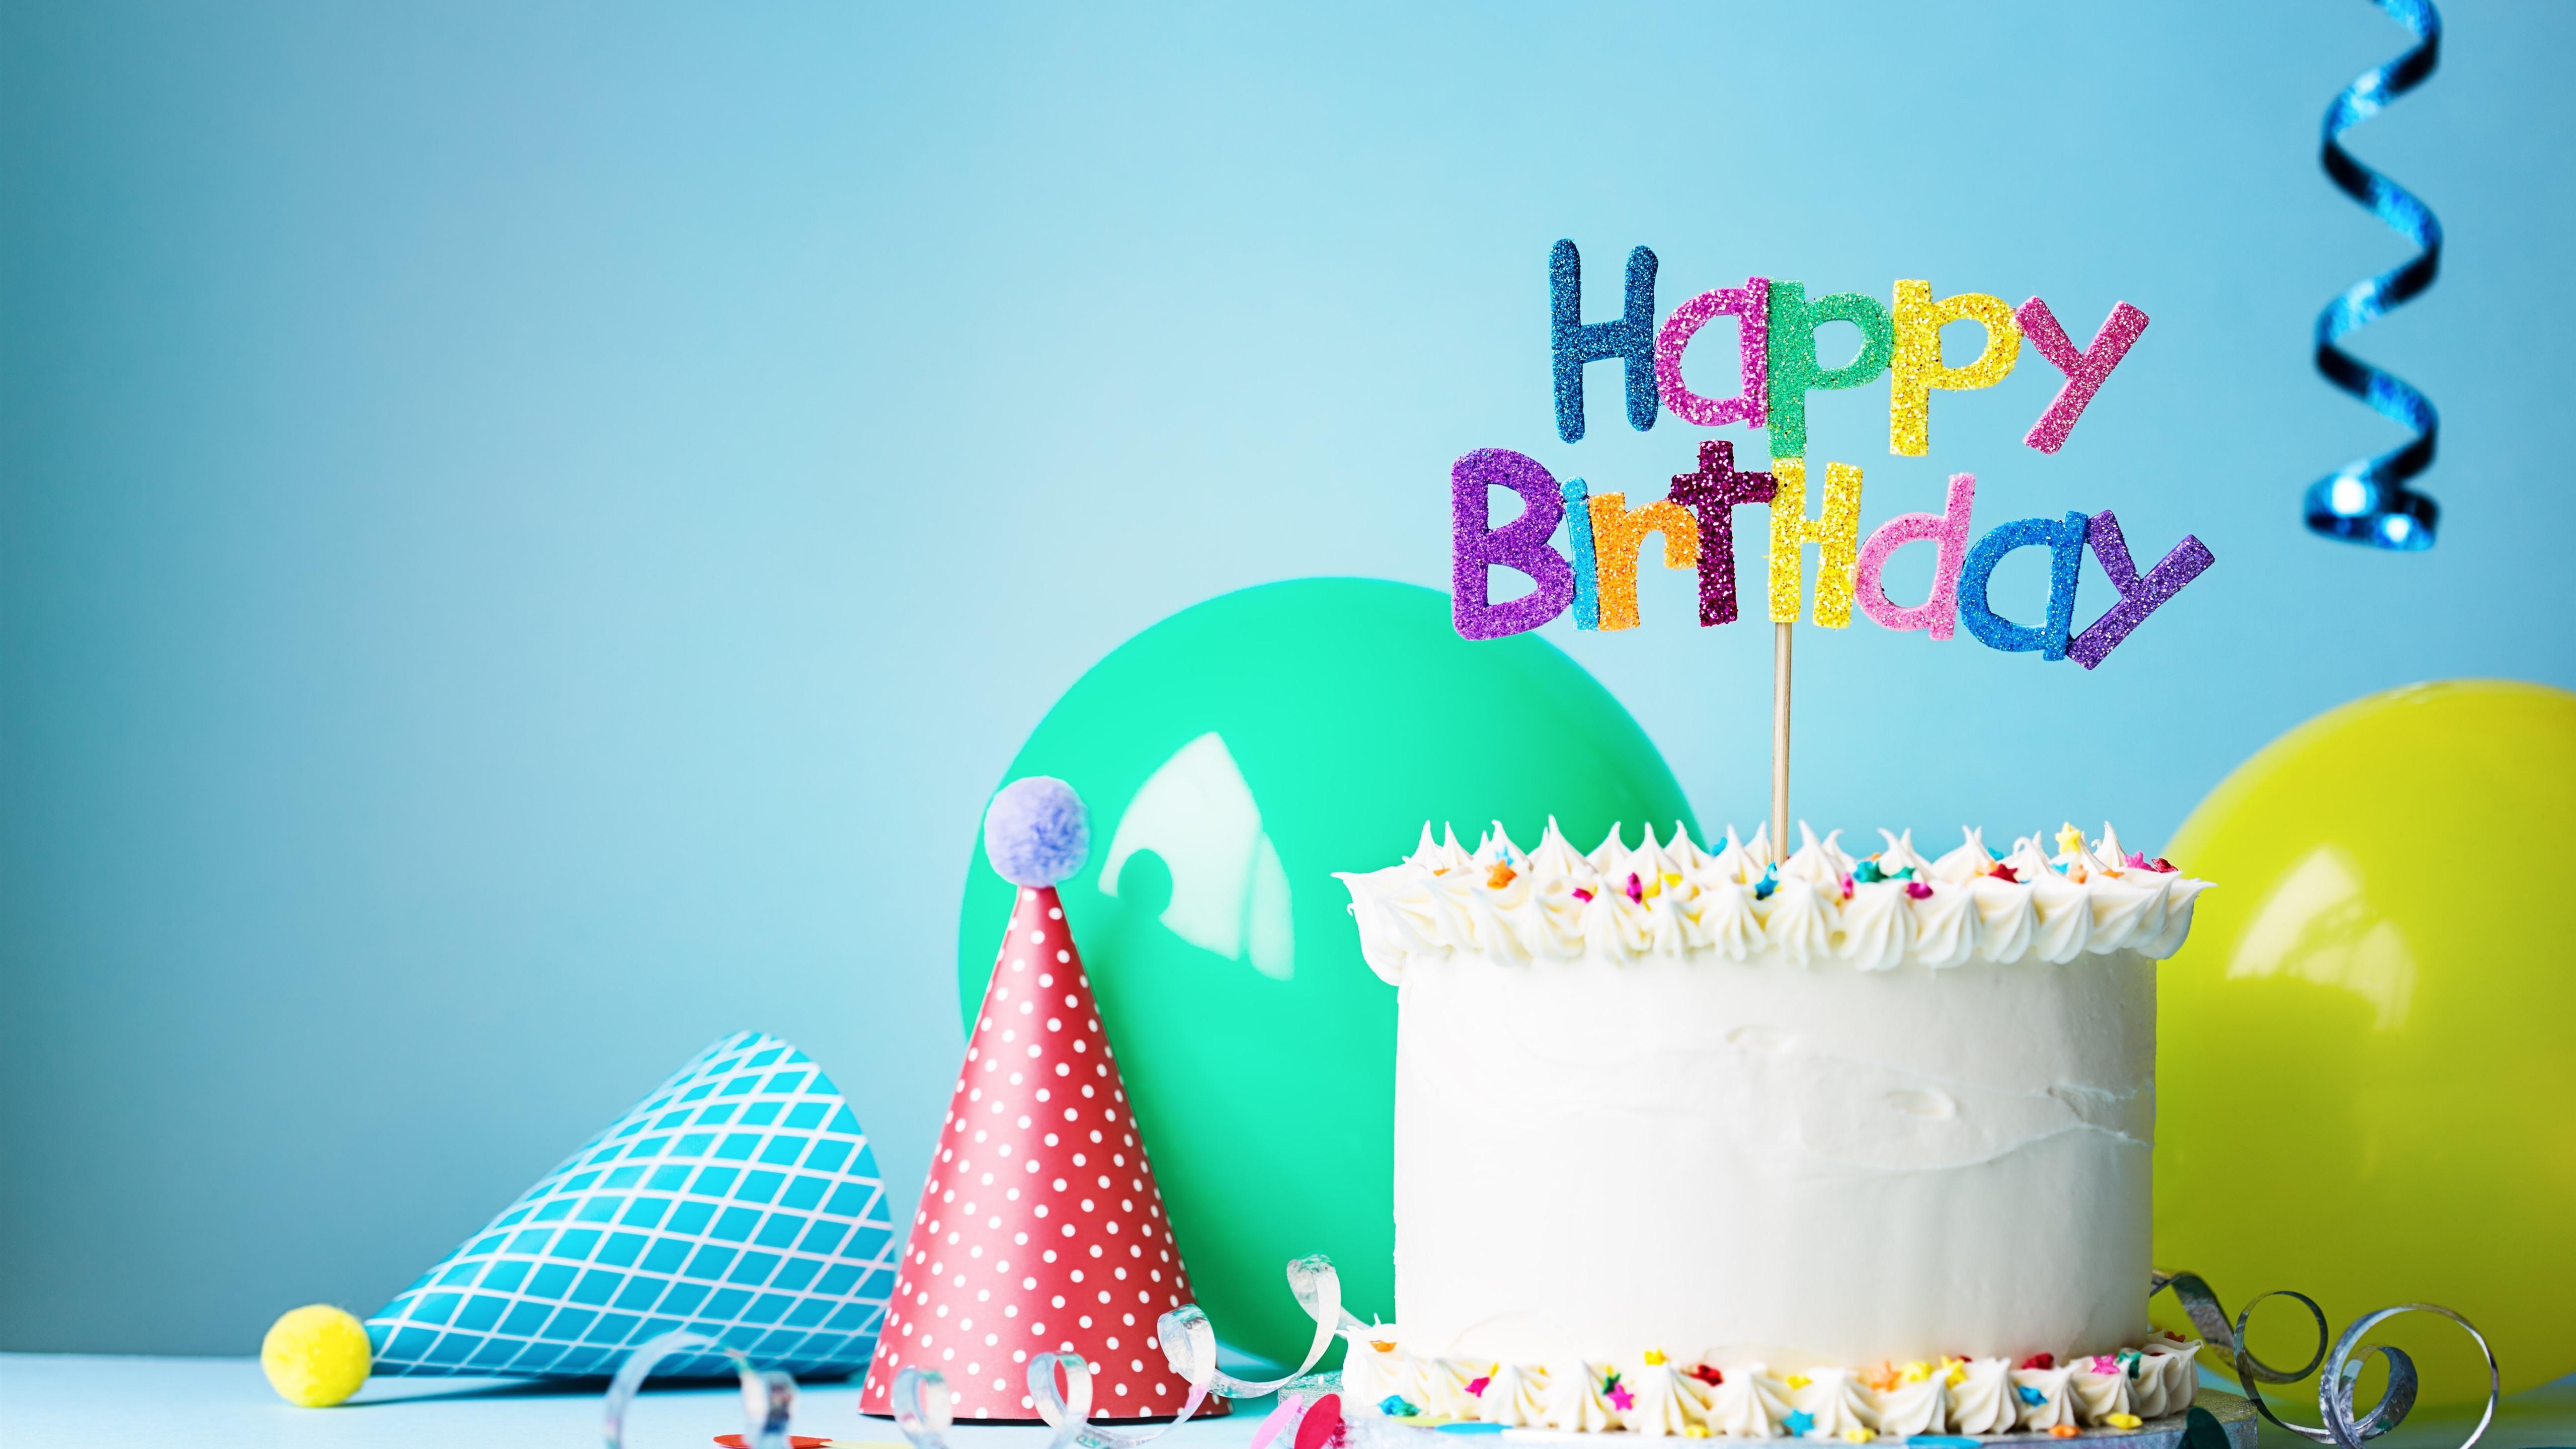 Remarkable Wallpaper Happy Birthday Cake Hat Balloon Ribbon 5120X2880 Uhd Funny Birthday Cards Online Aboleapandamsfinfo